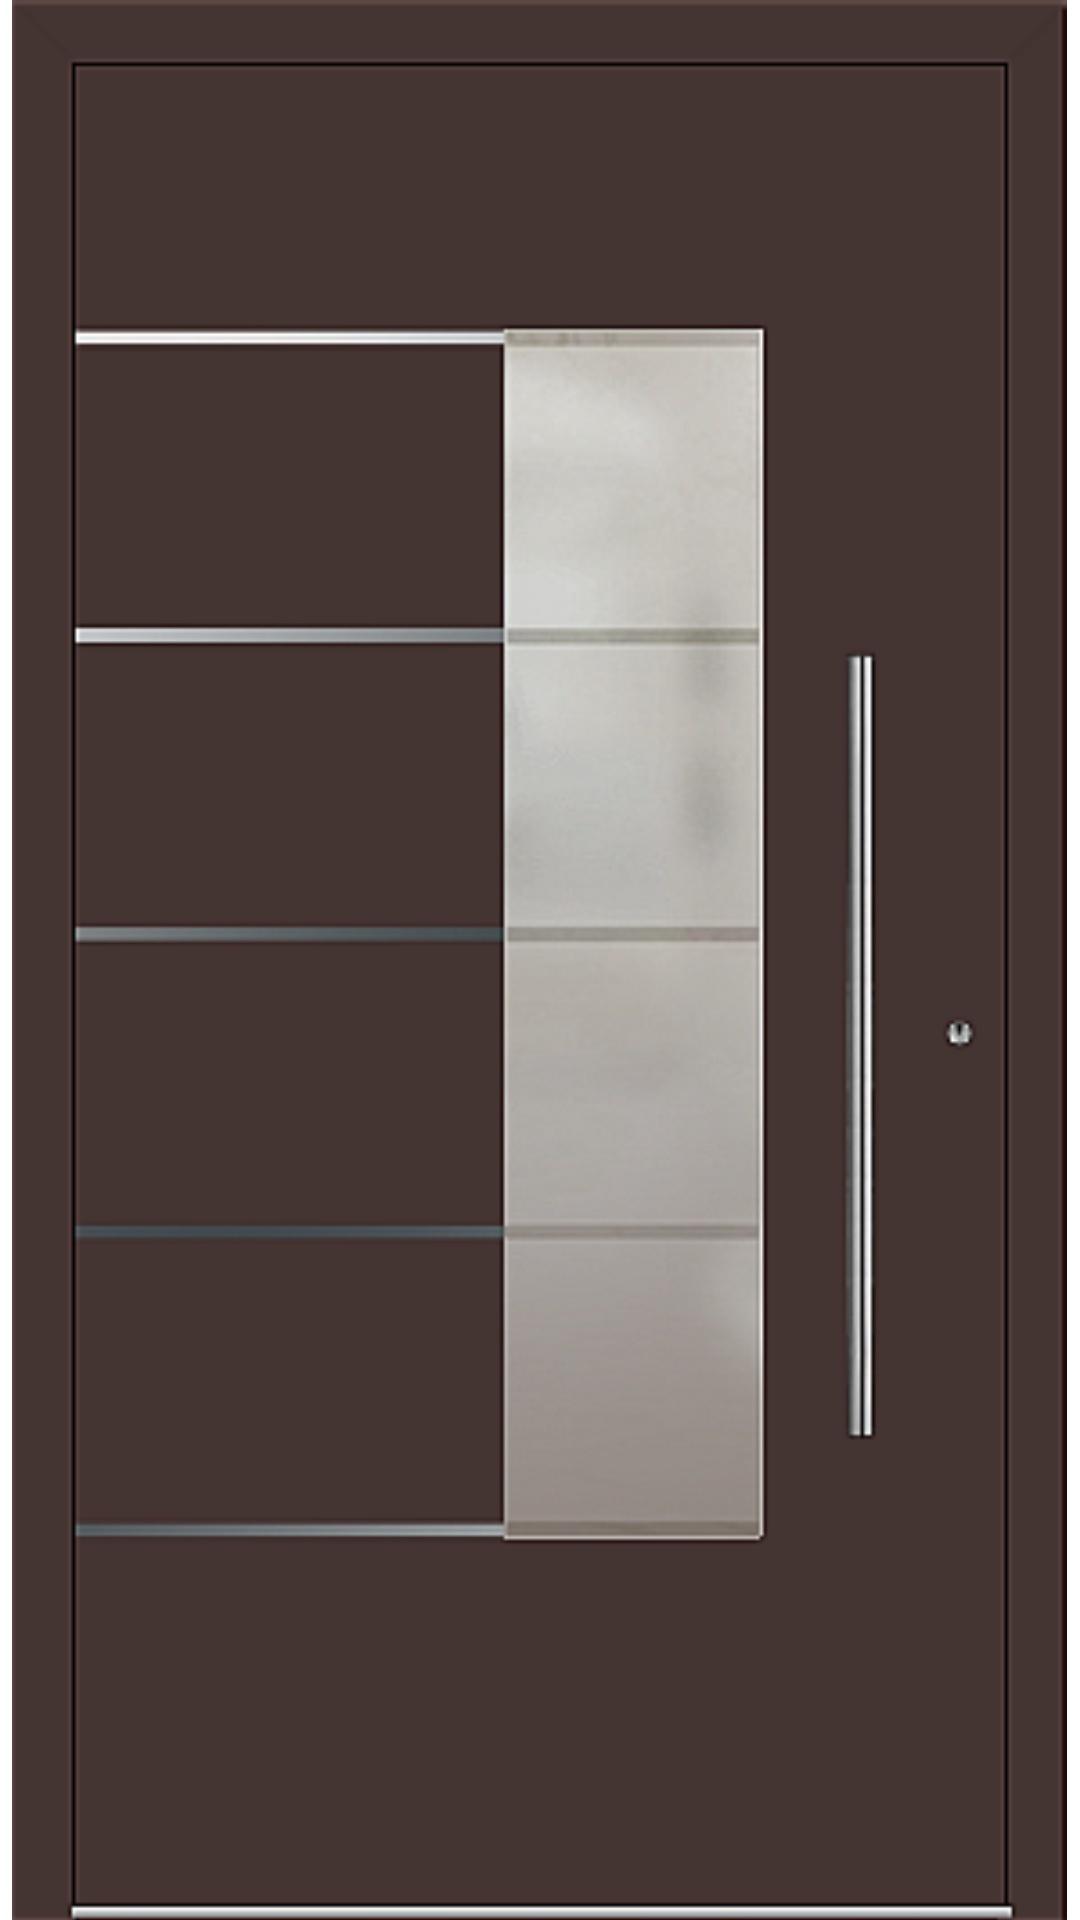 PaXentrée Aluminium Haustür M02551 mahagonibraun